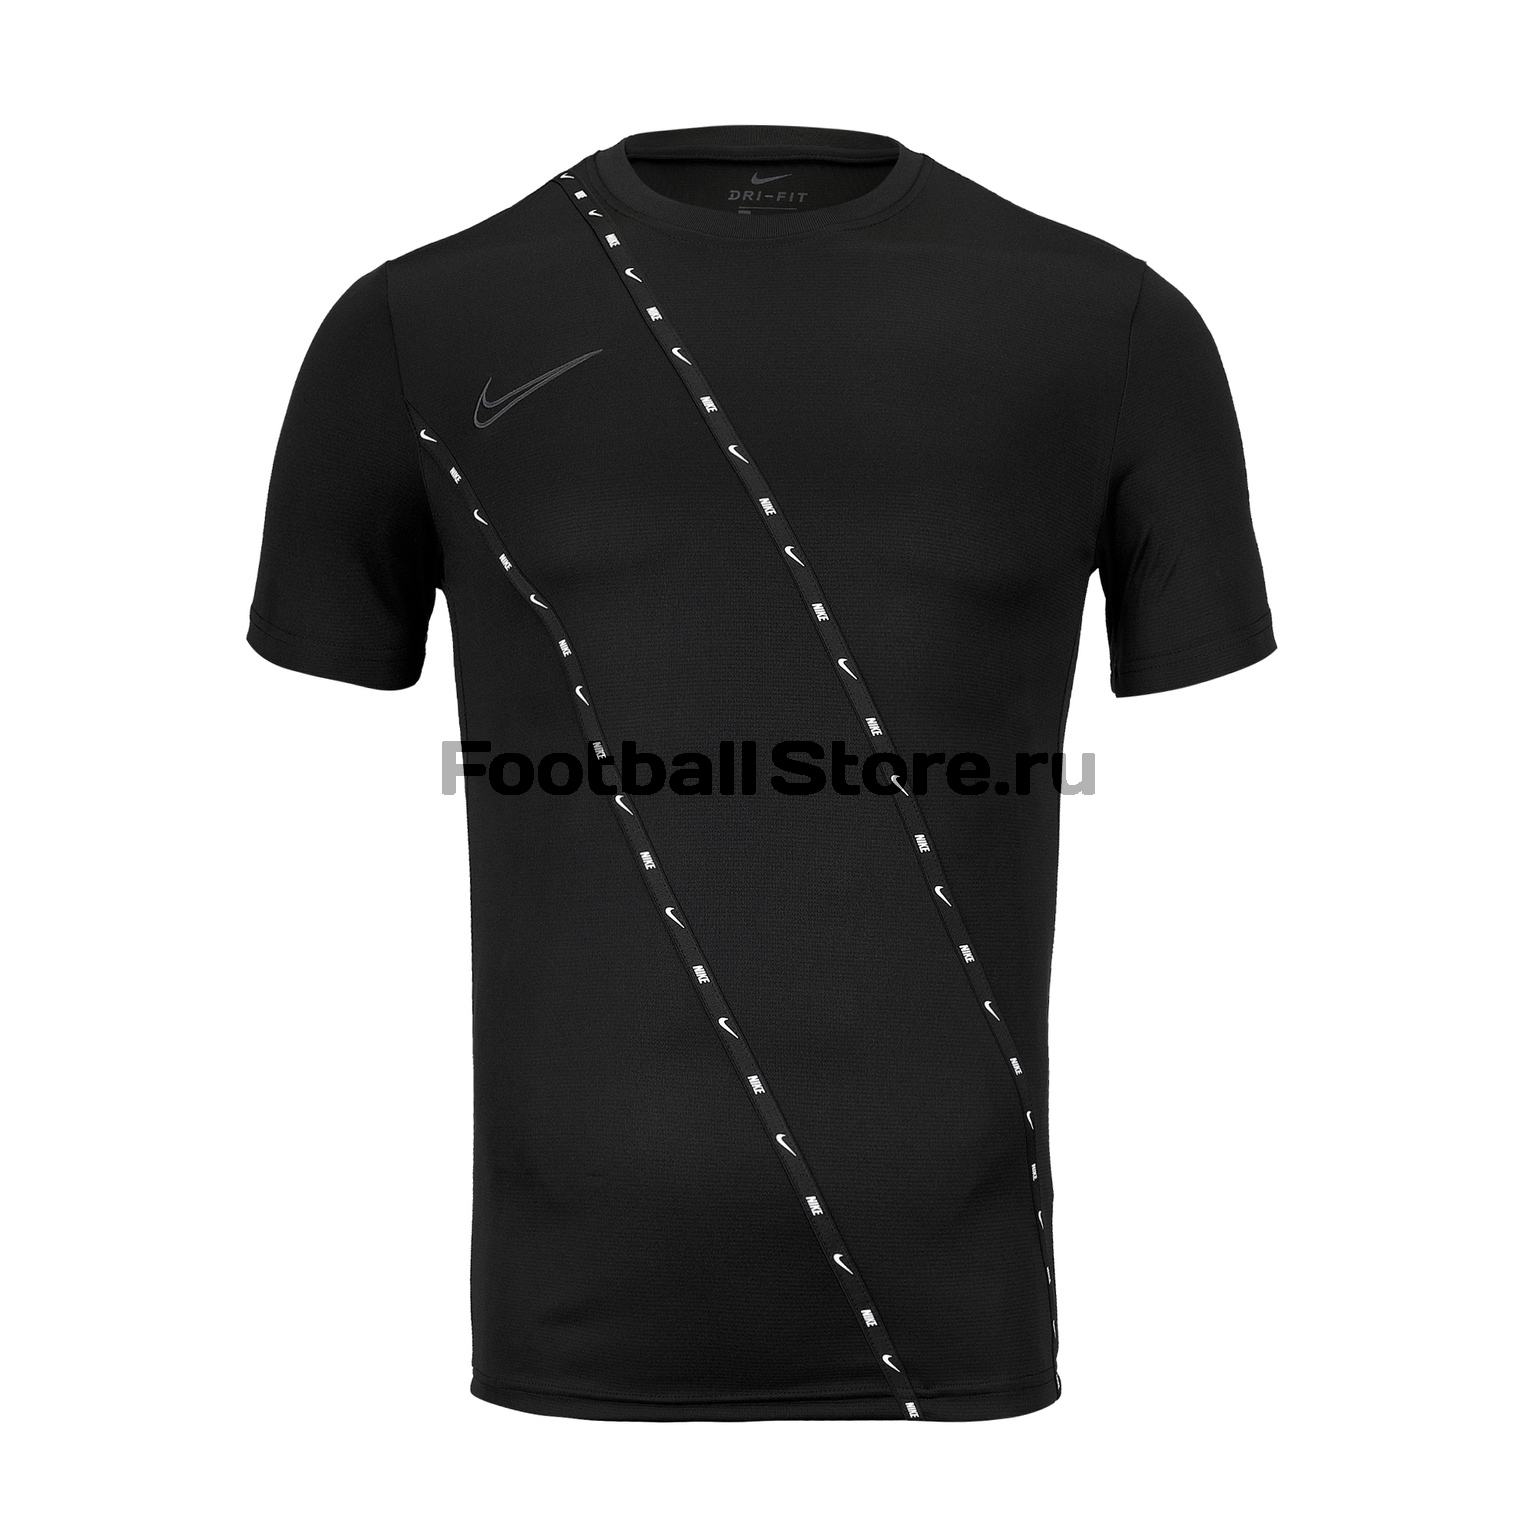 Футболка Nike Dry Academy Top GX AT5714-010 футболка тренировочная nike strike top at5870 010